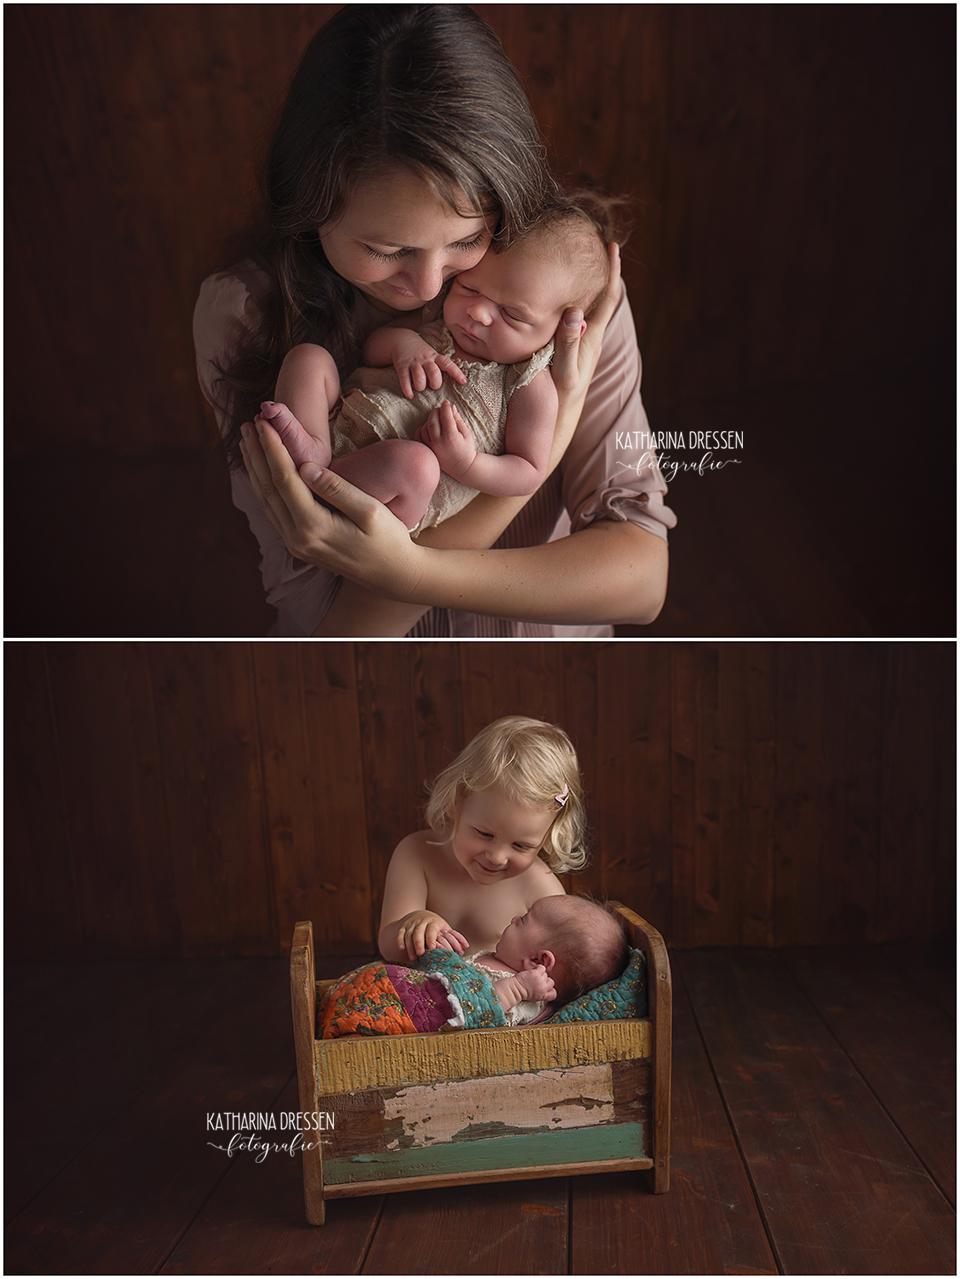 06_Babyfotograf_Baby-Fotoshooting_Neugeborenes_Geburt_Schwangerschaft_Hebamme_Schwanger_Fotograf_Duesseldorf_Koeln_Moenchengladbach